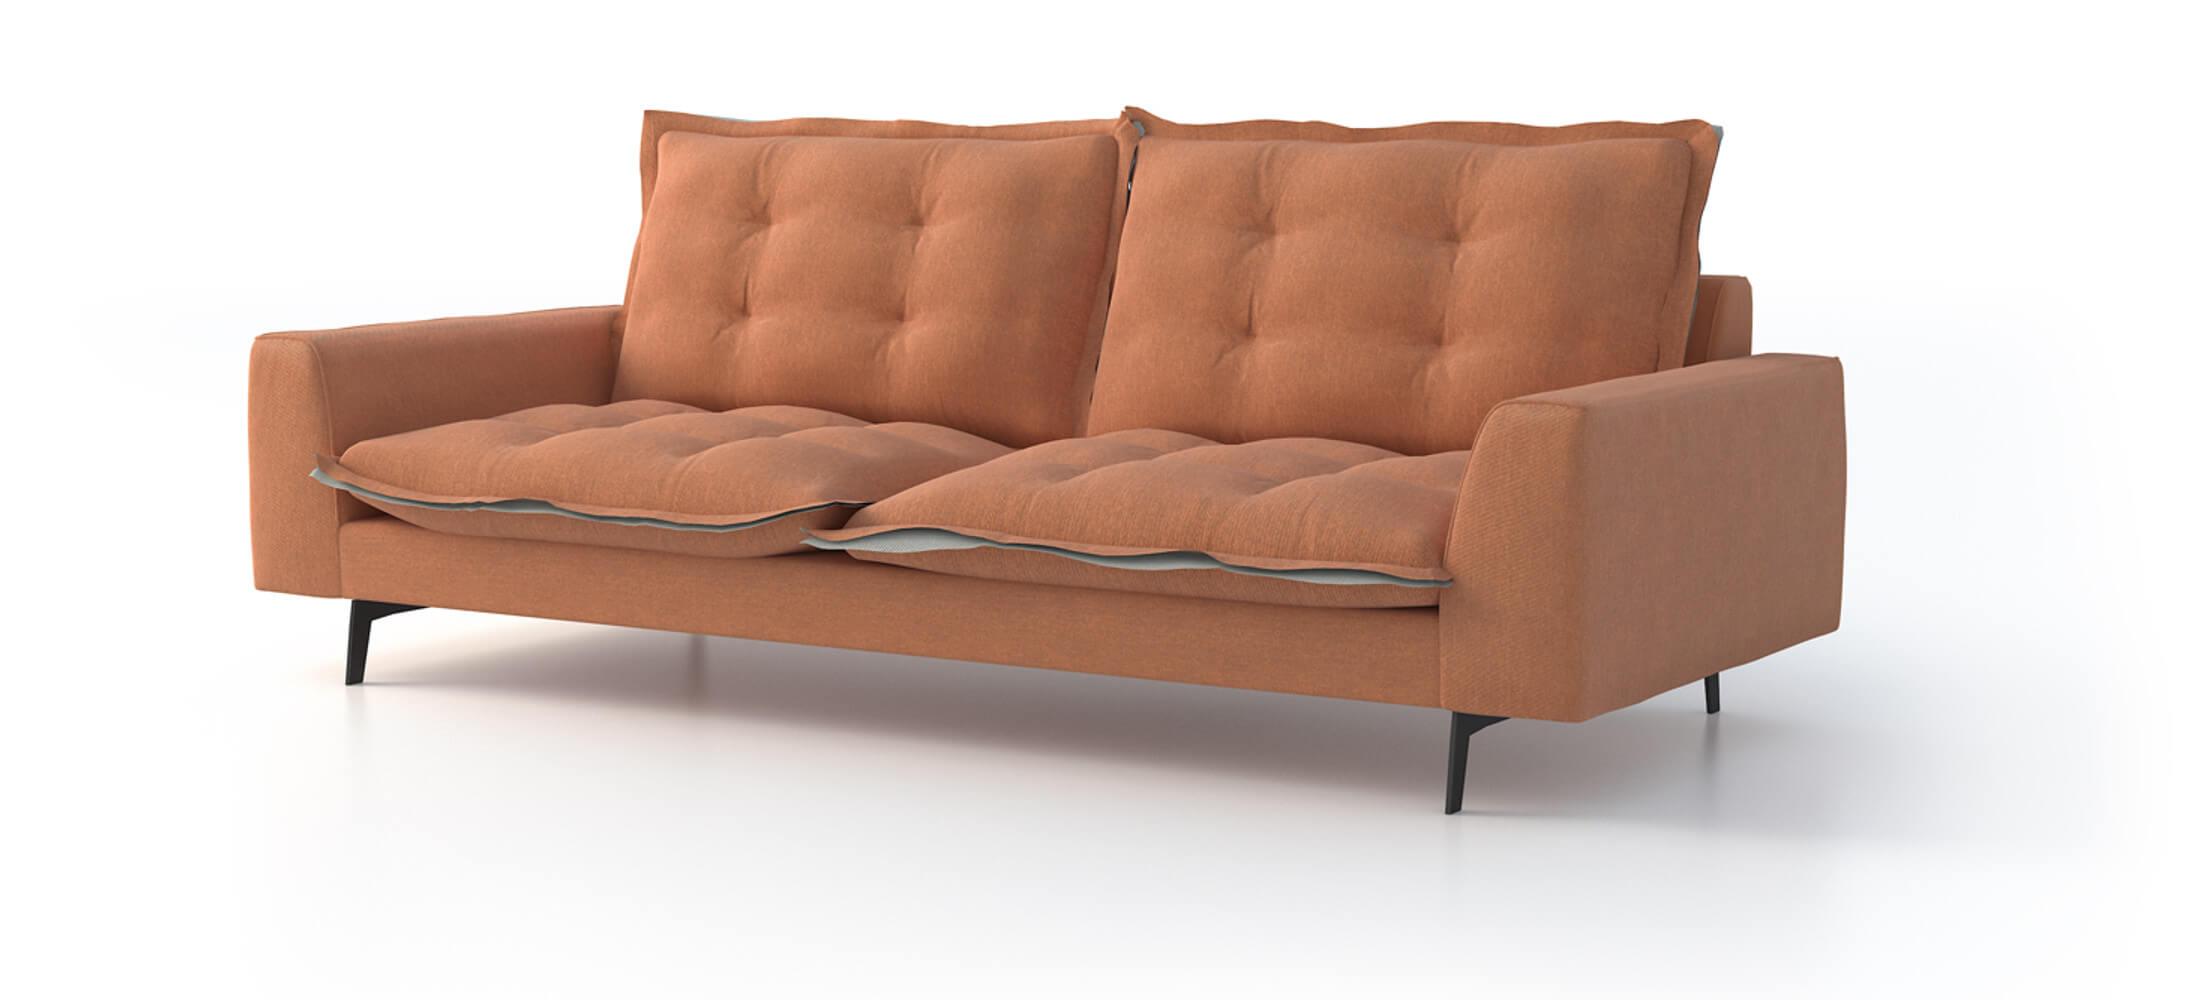 mejores sofas castellon